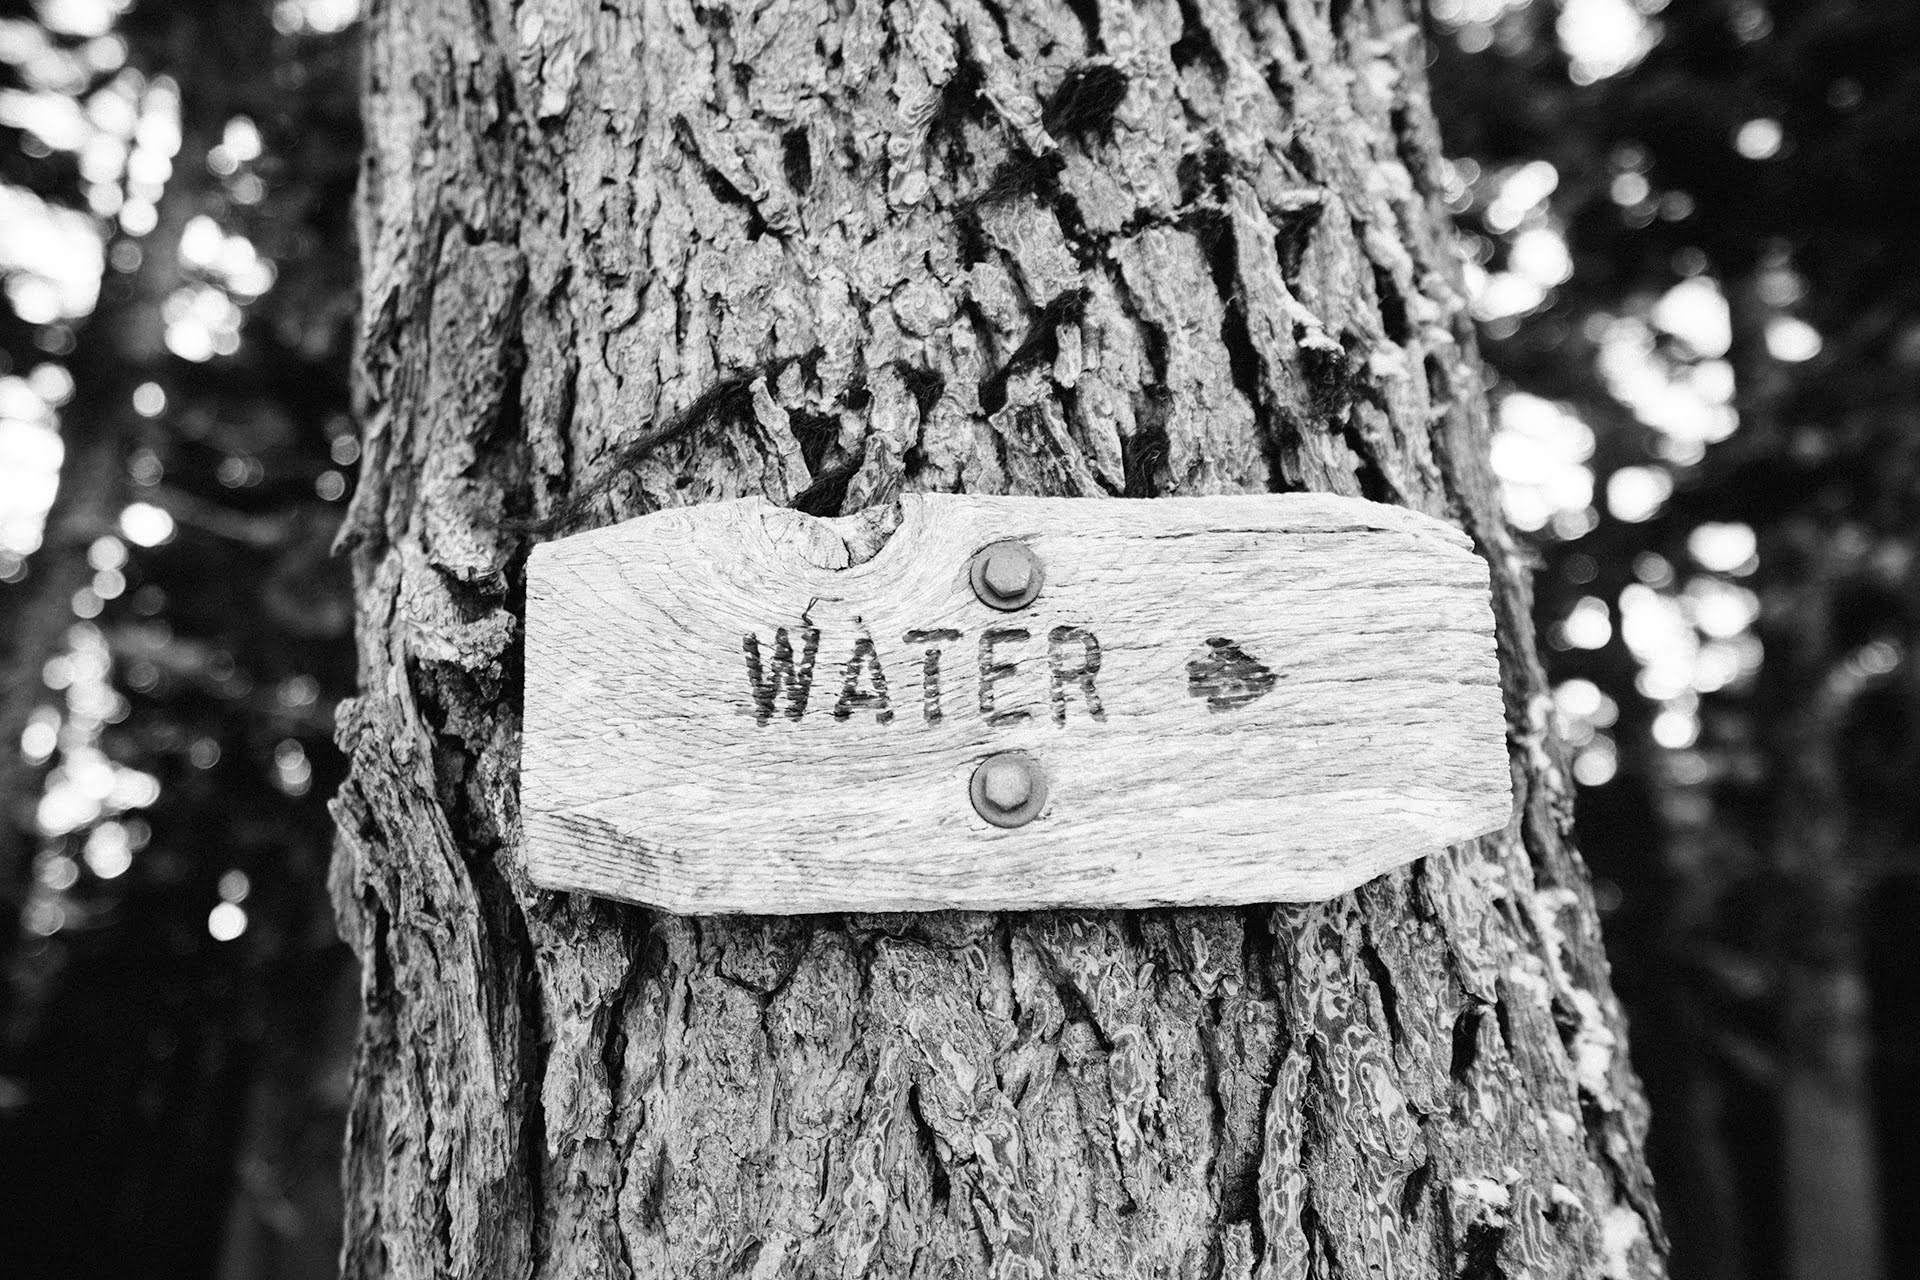 water sign arrow direction 20161213 健康喝水:每人每日飲水量(計算)、適合喝水的時間與正確喝水方式